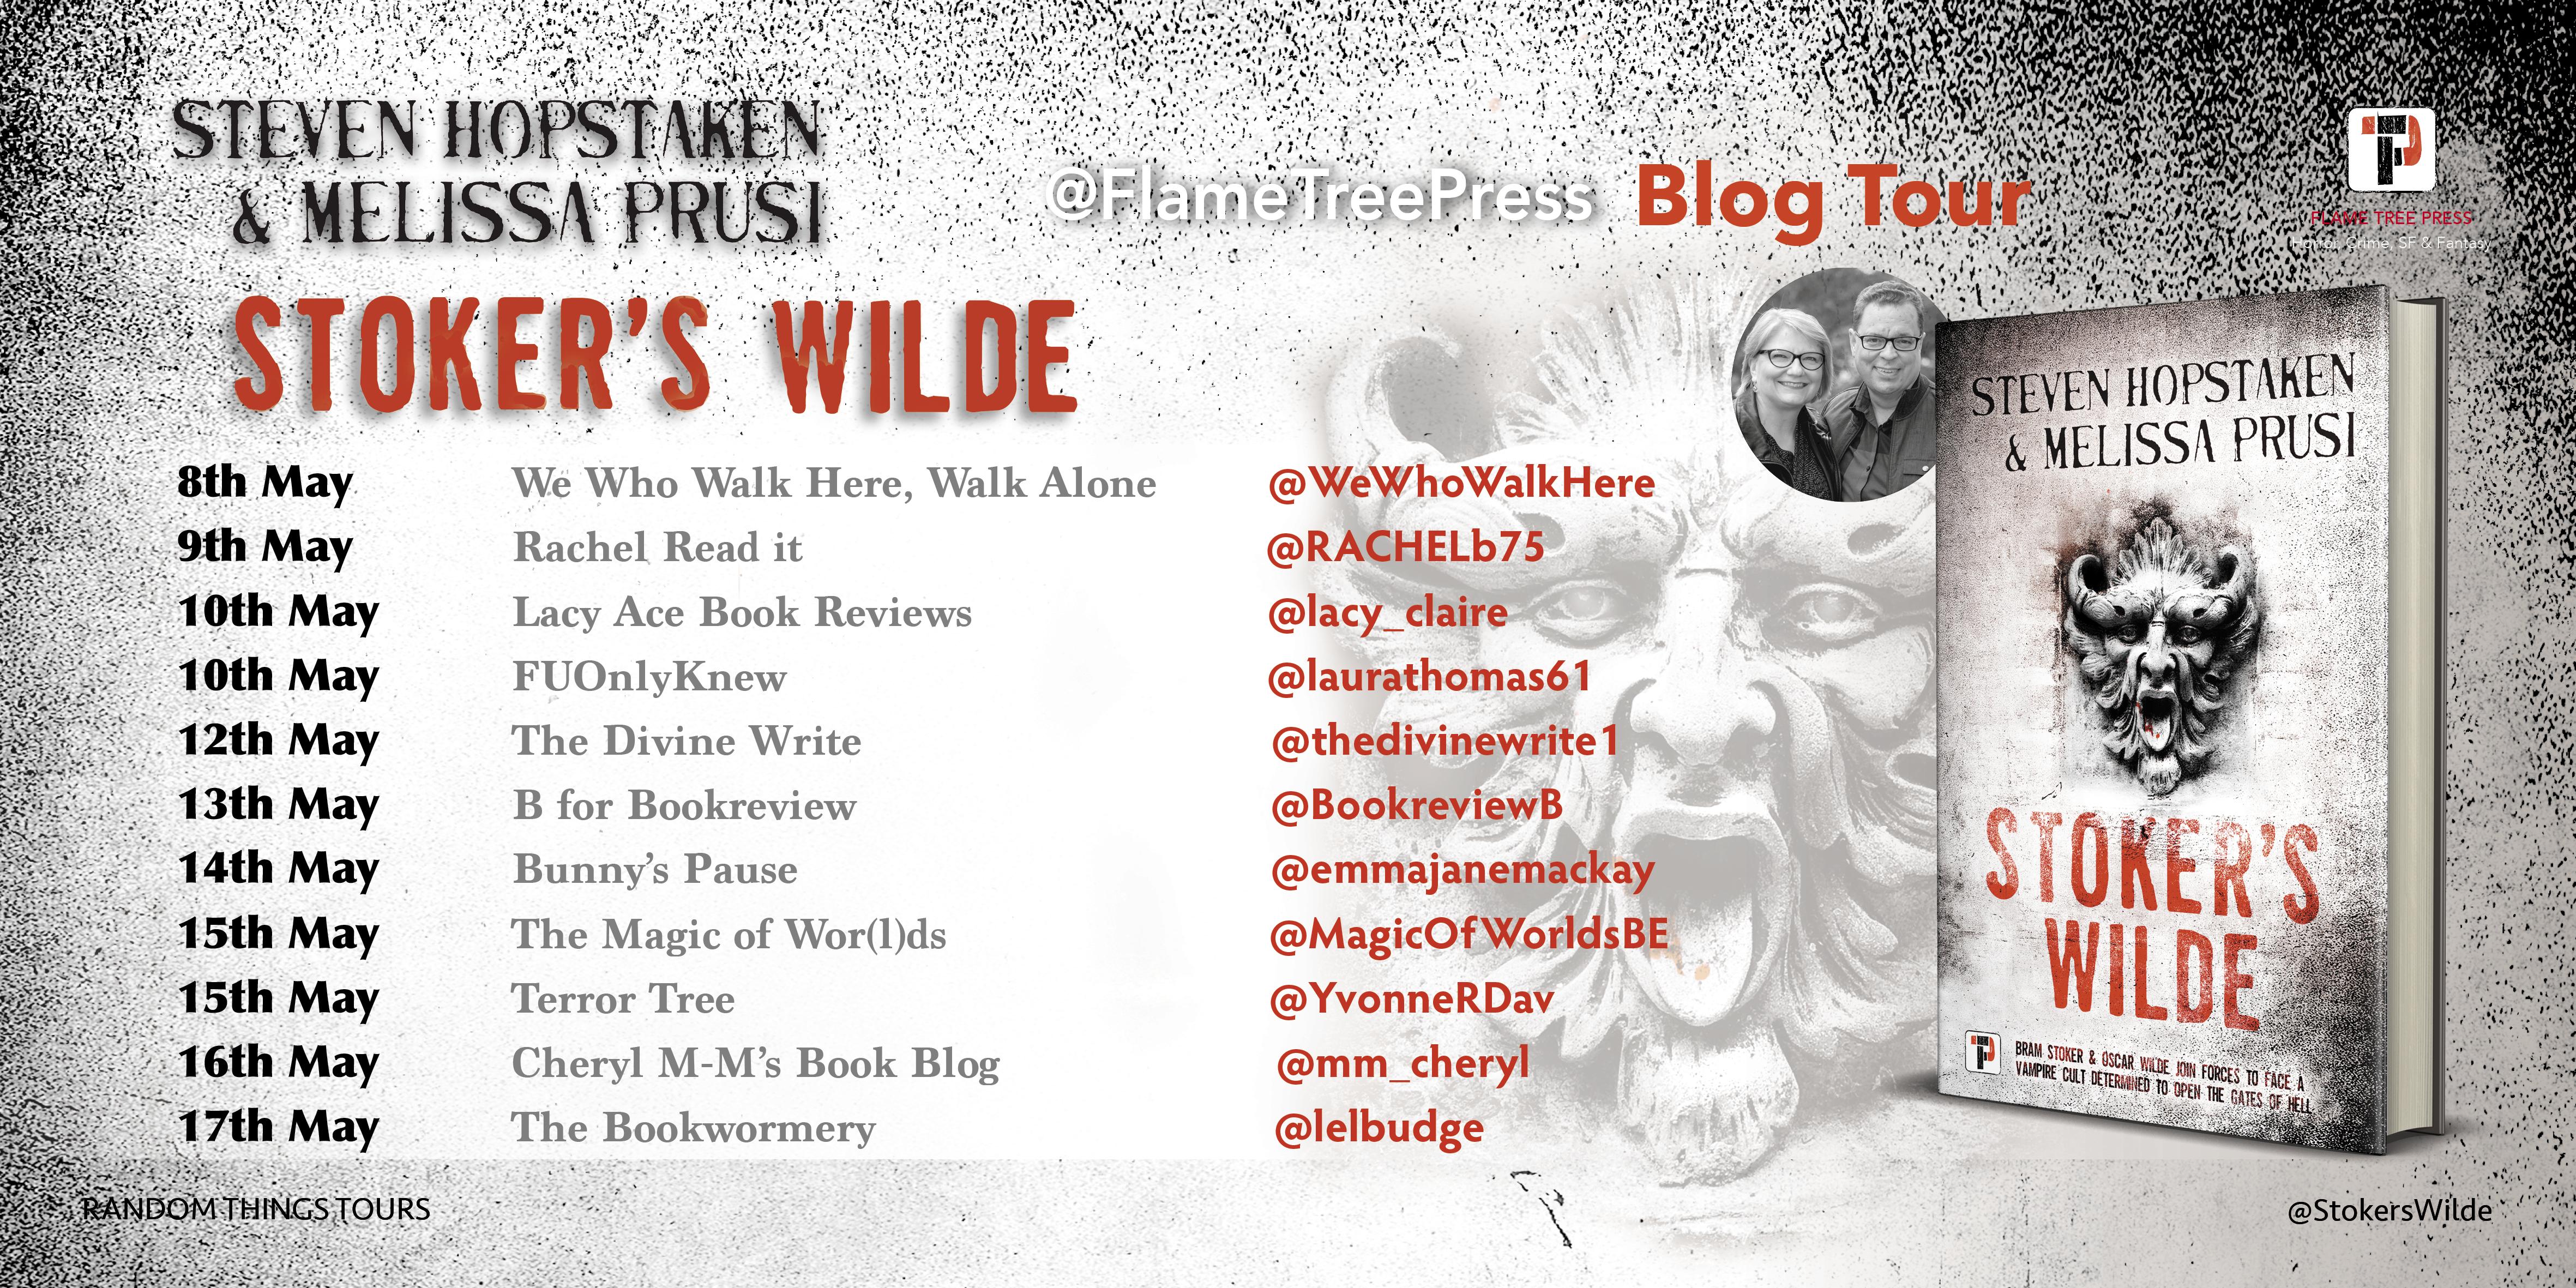 Steven Hopstaken, Melissa Prusi - Stoker's Wilde Tour